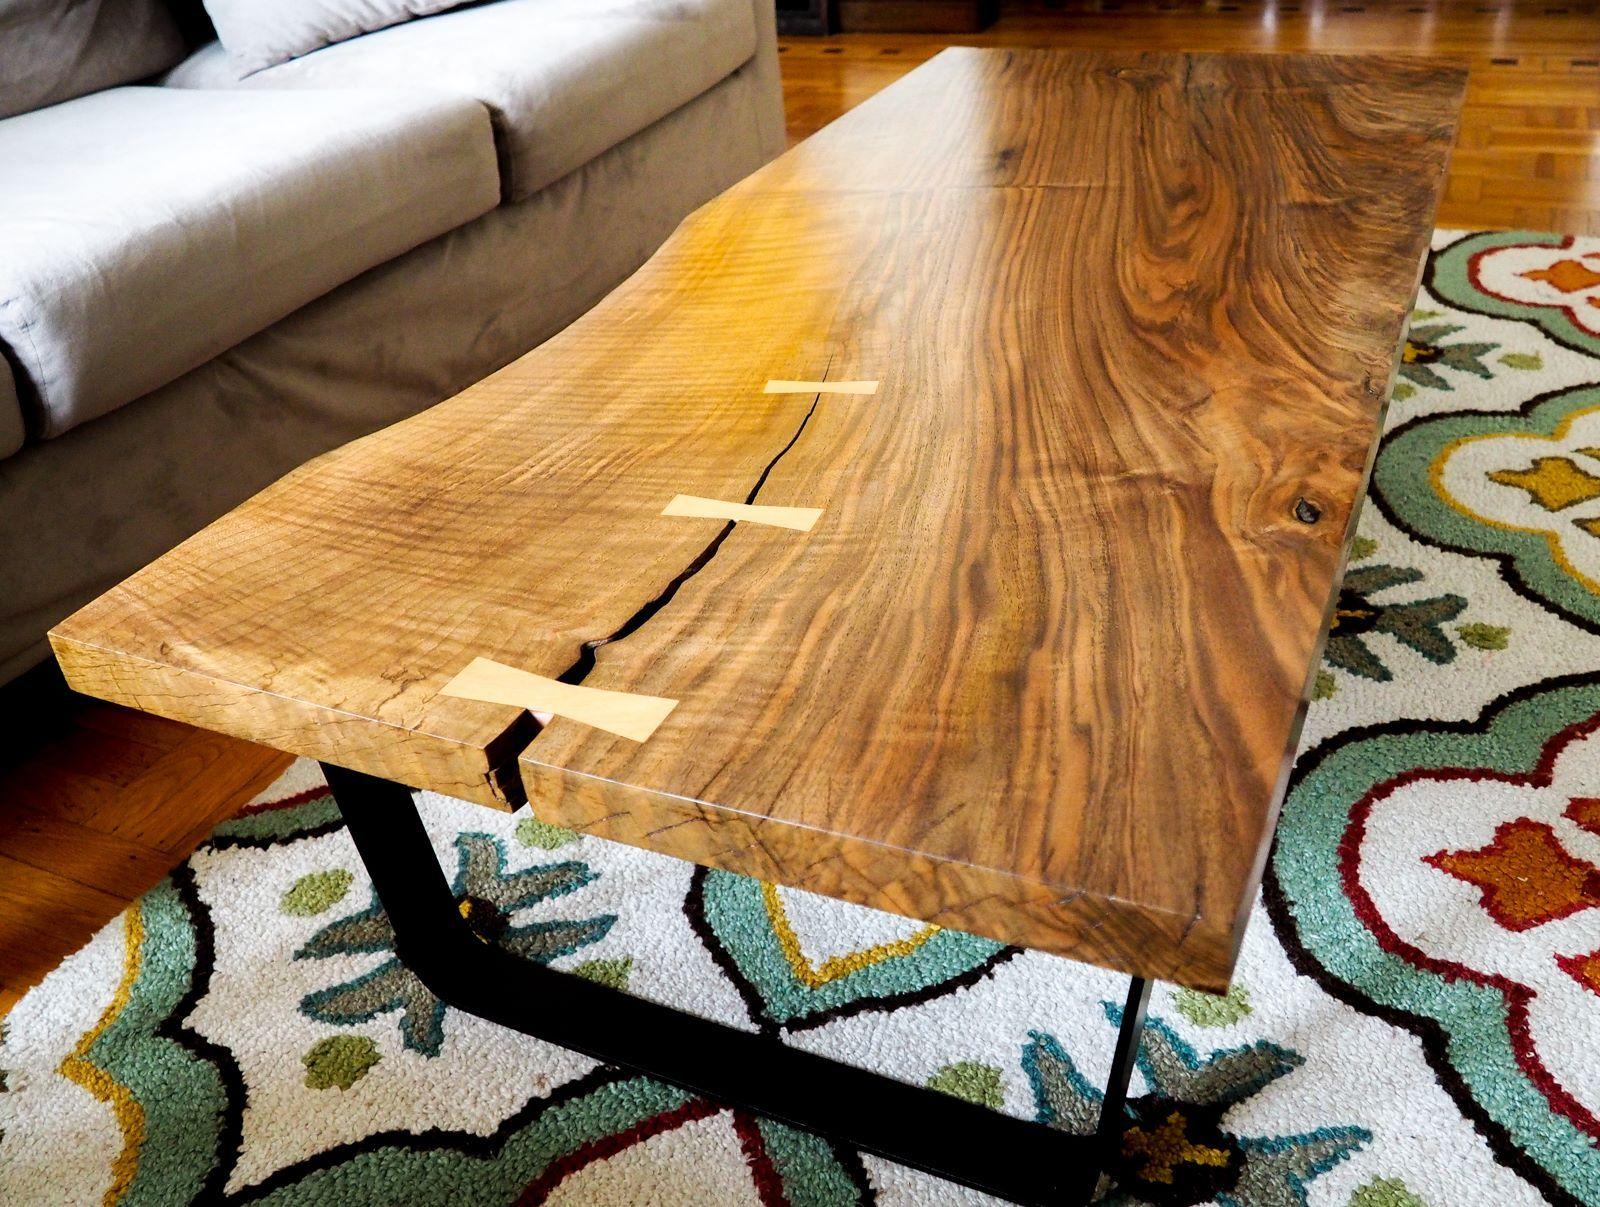 Handmade walnut wood coffee table by Baker Original coffeetable